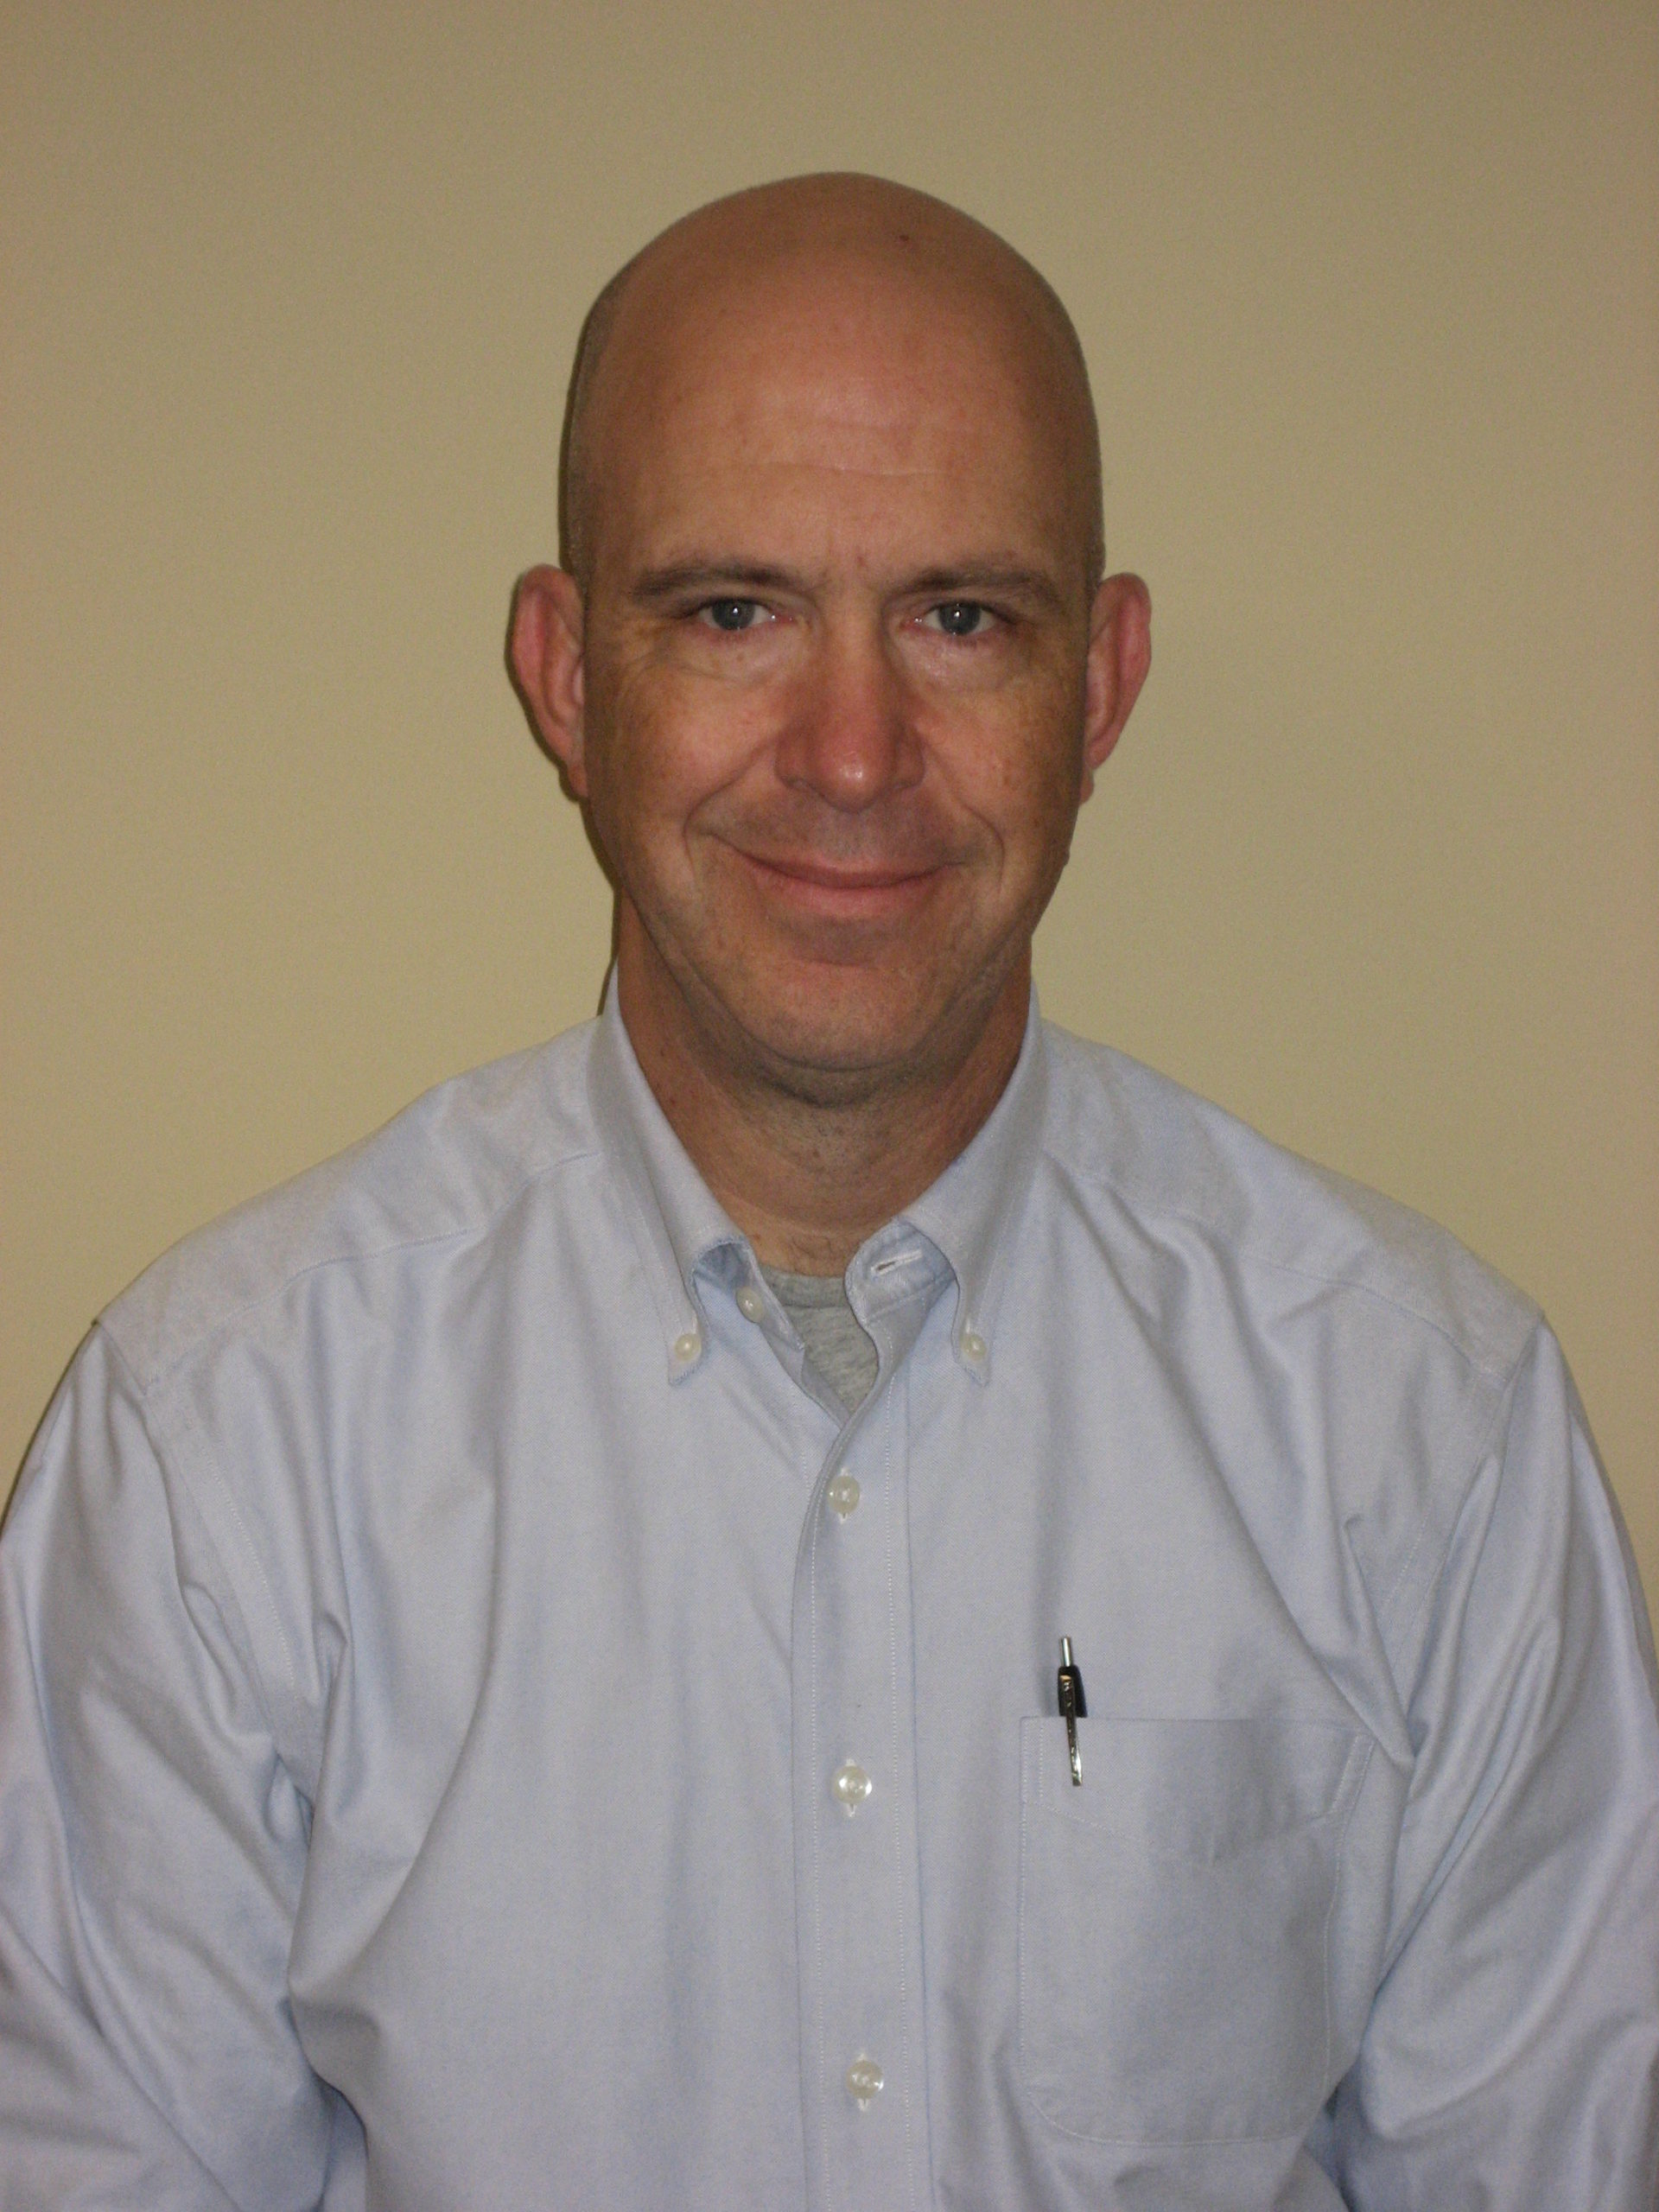 Chris Burns, MS, PMHNP-BC